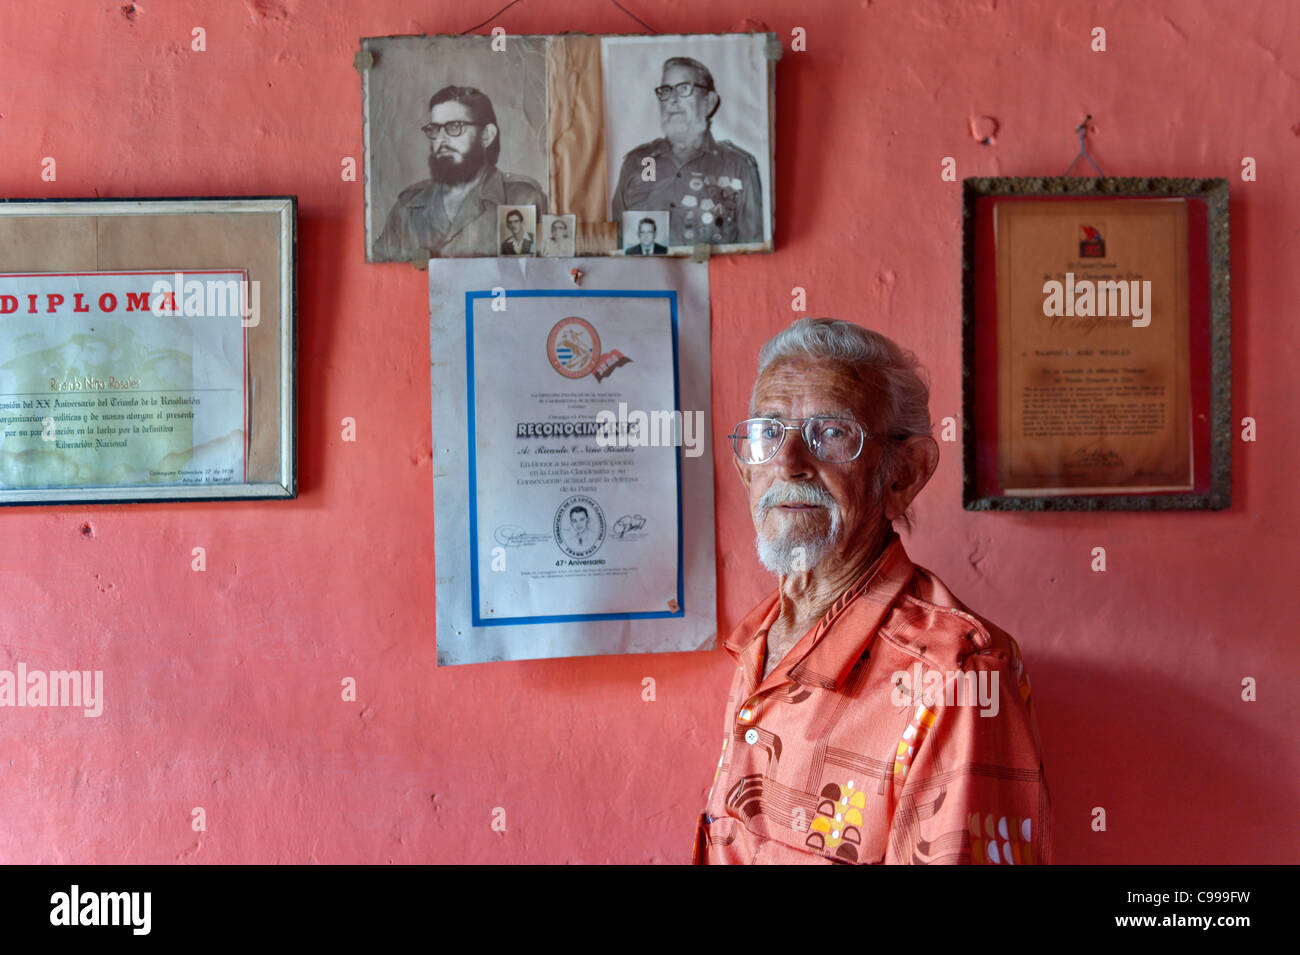 Alte Veteranen mit Bildern der Revolution Camagüey, Kuba Stockbild